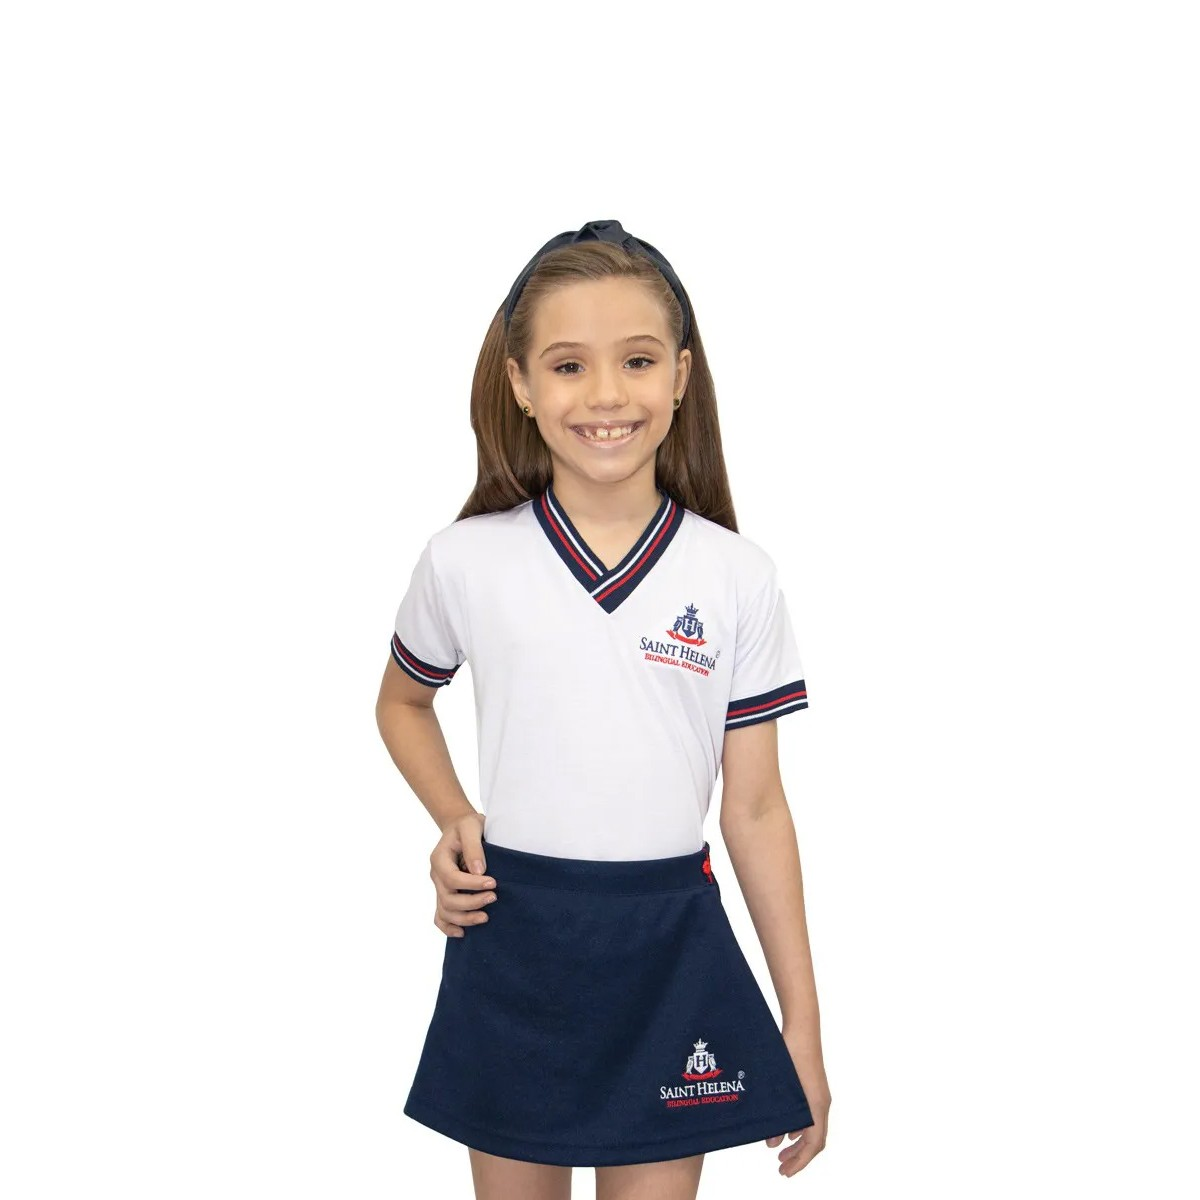 Camiseta Baby Look gola V - Colégio Saint Helena